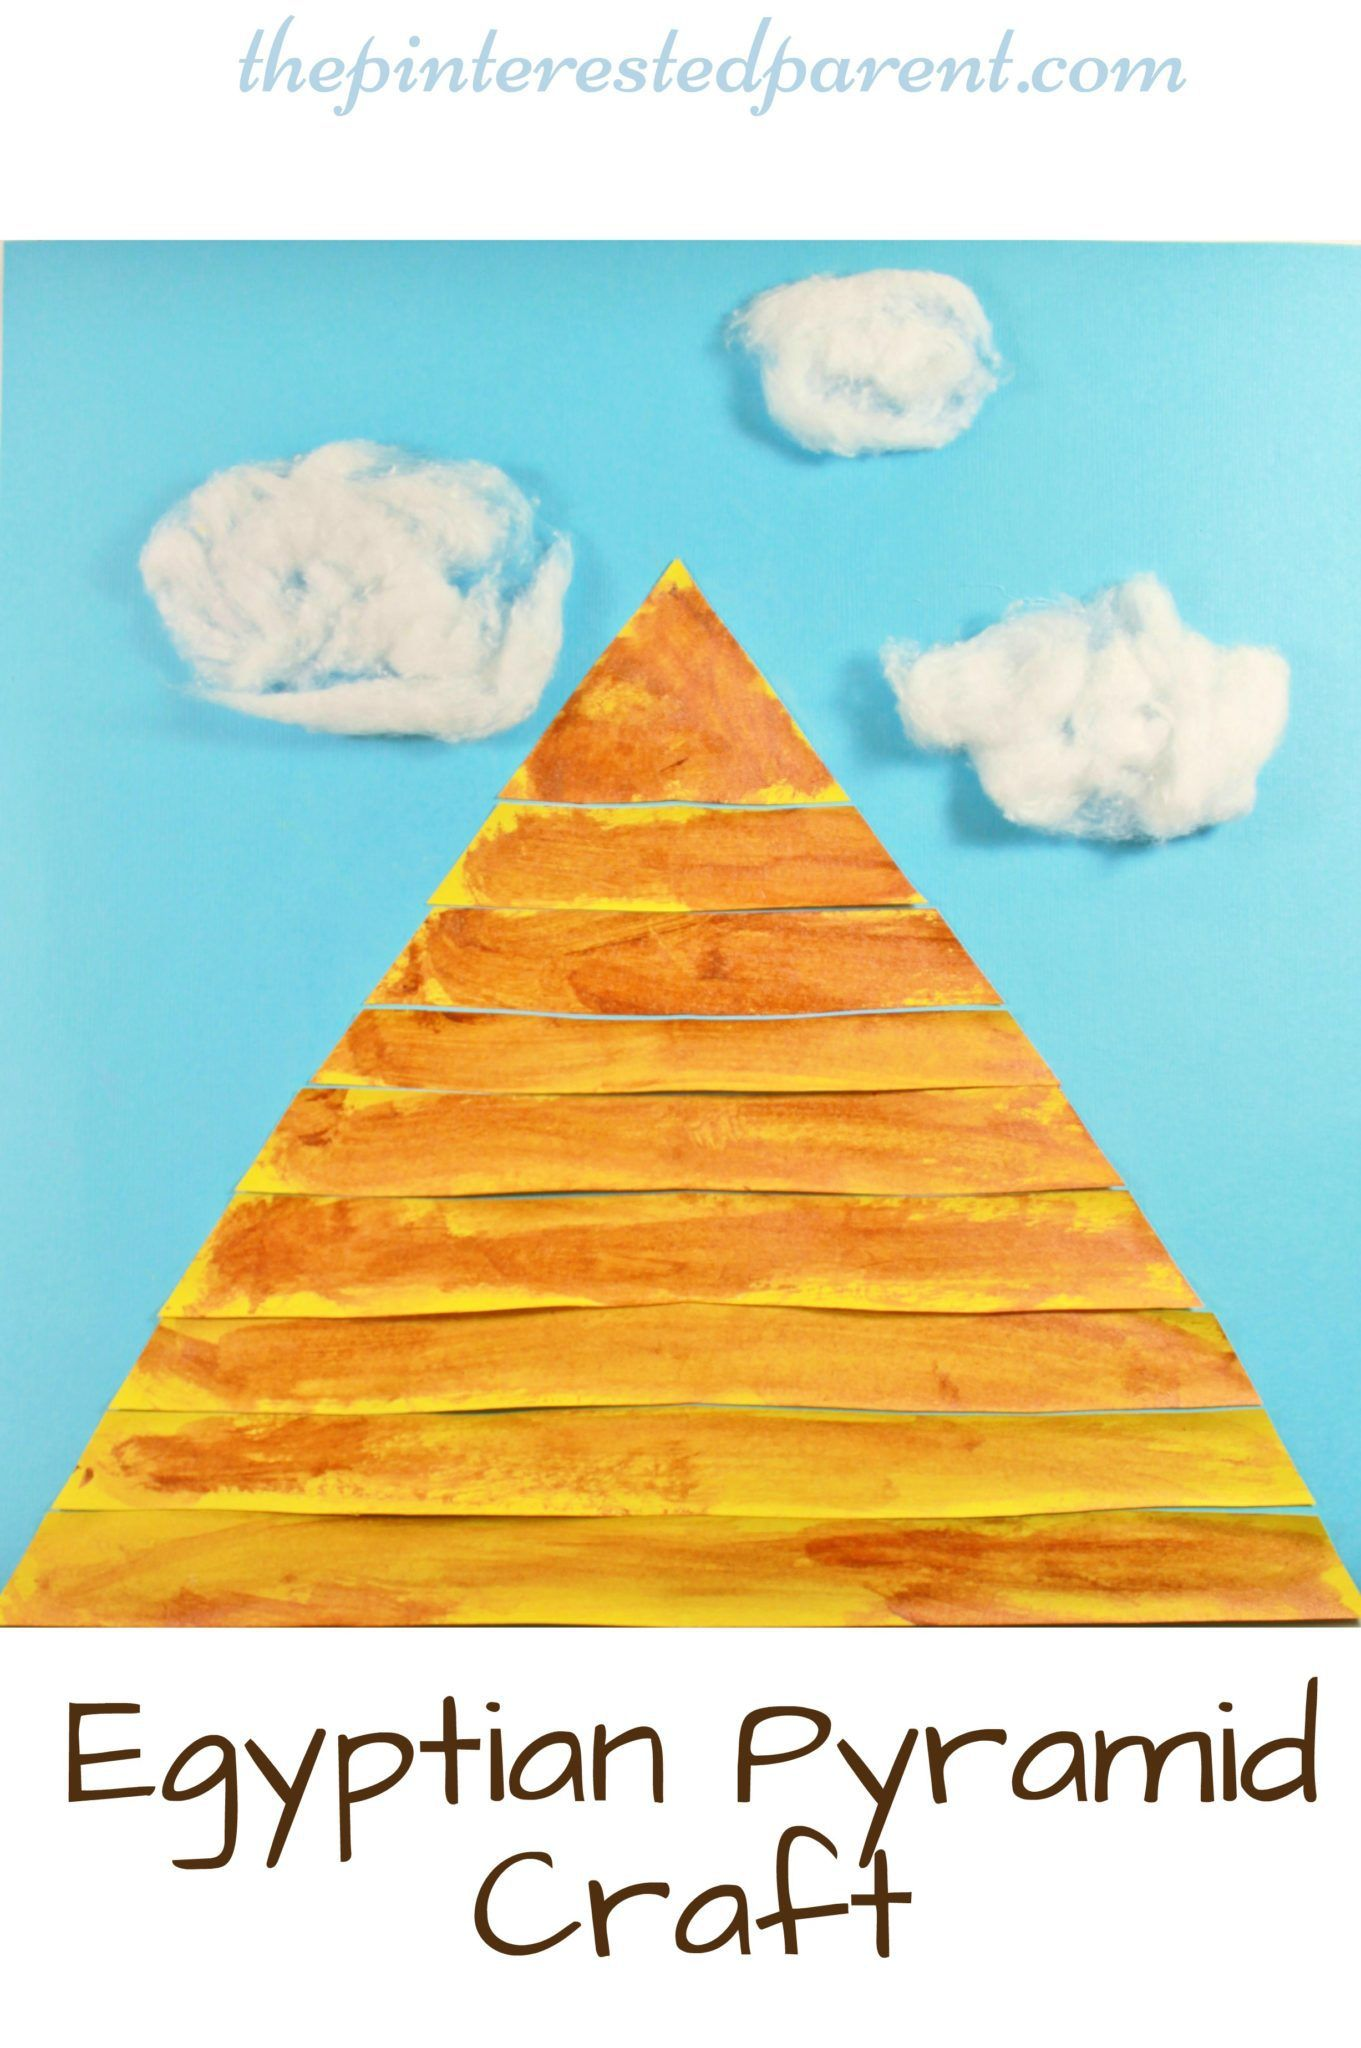 Egyptian Pyramid Craft